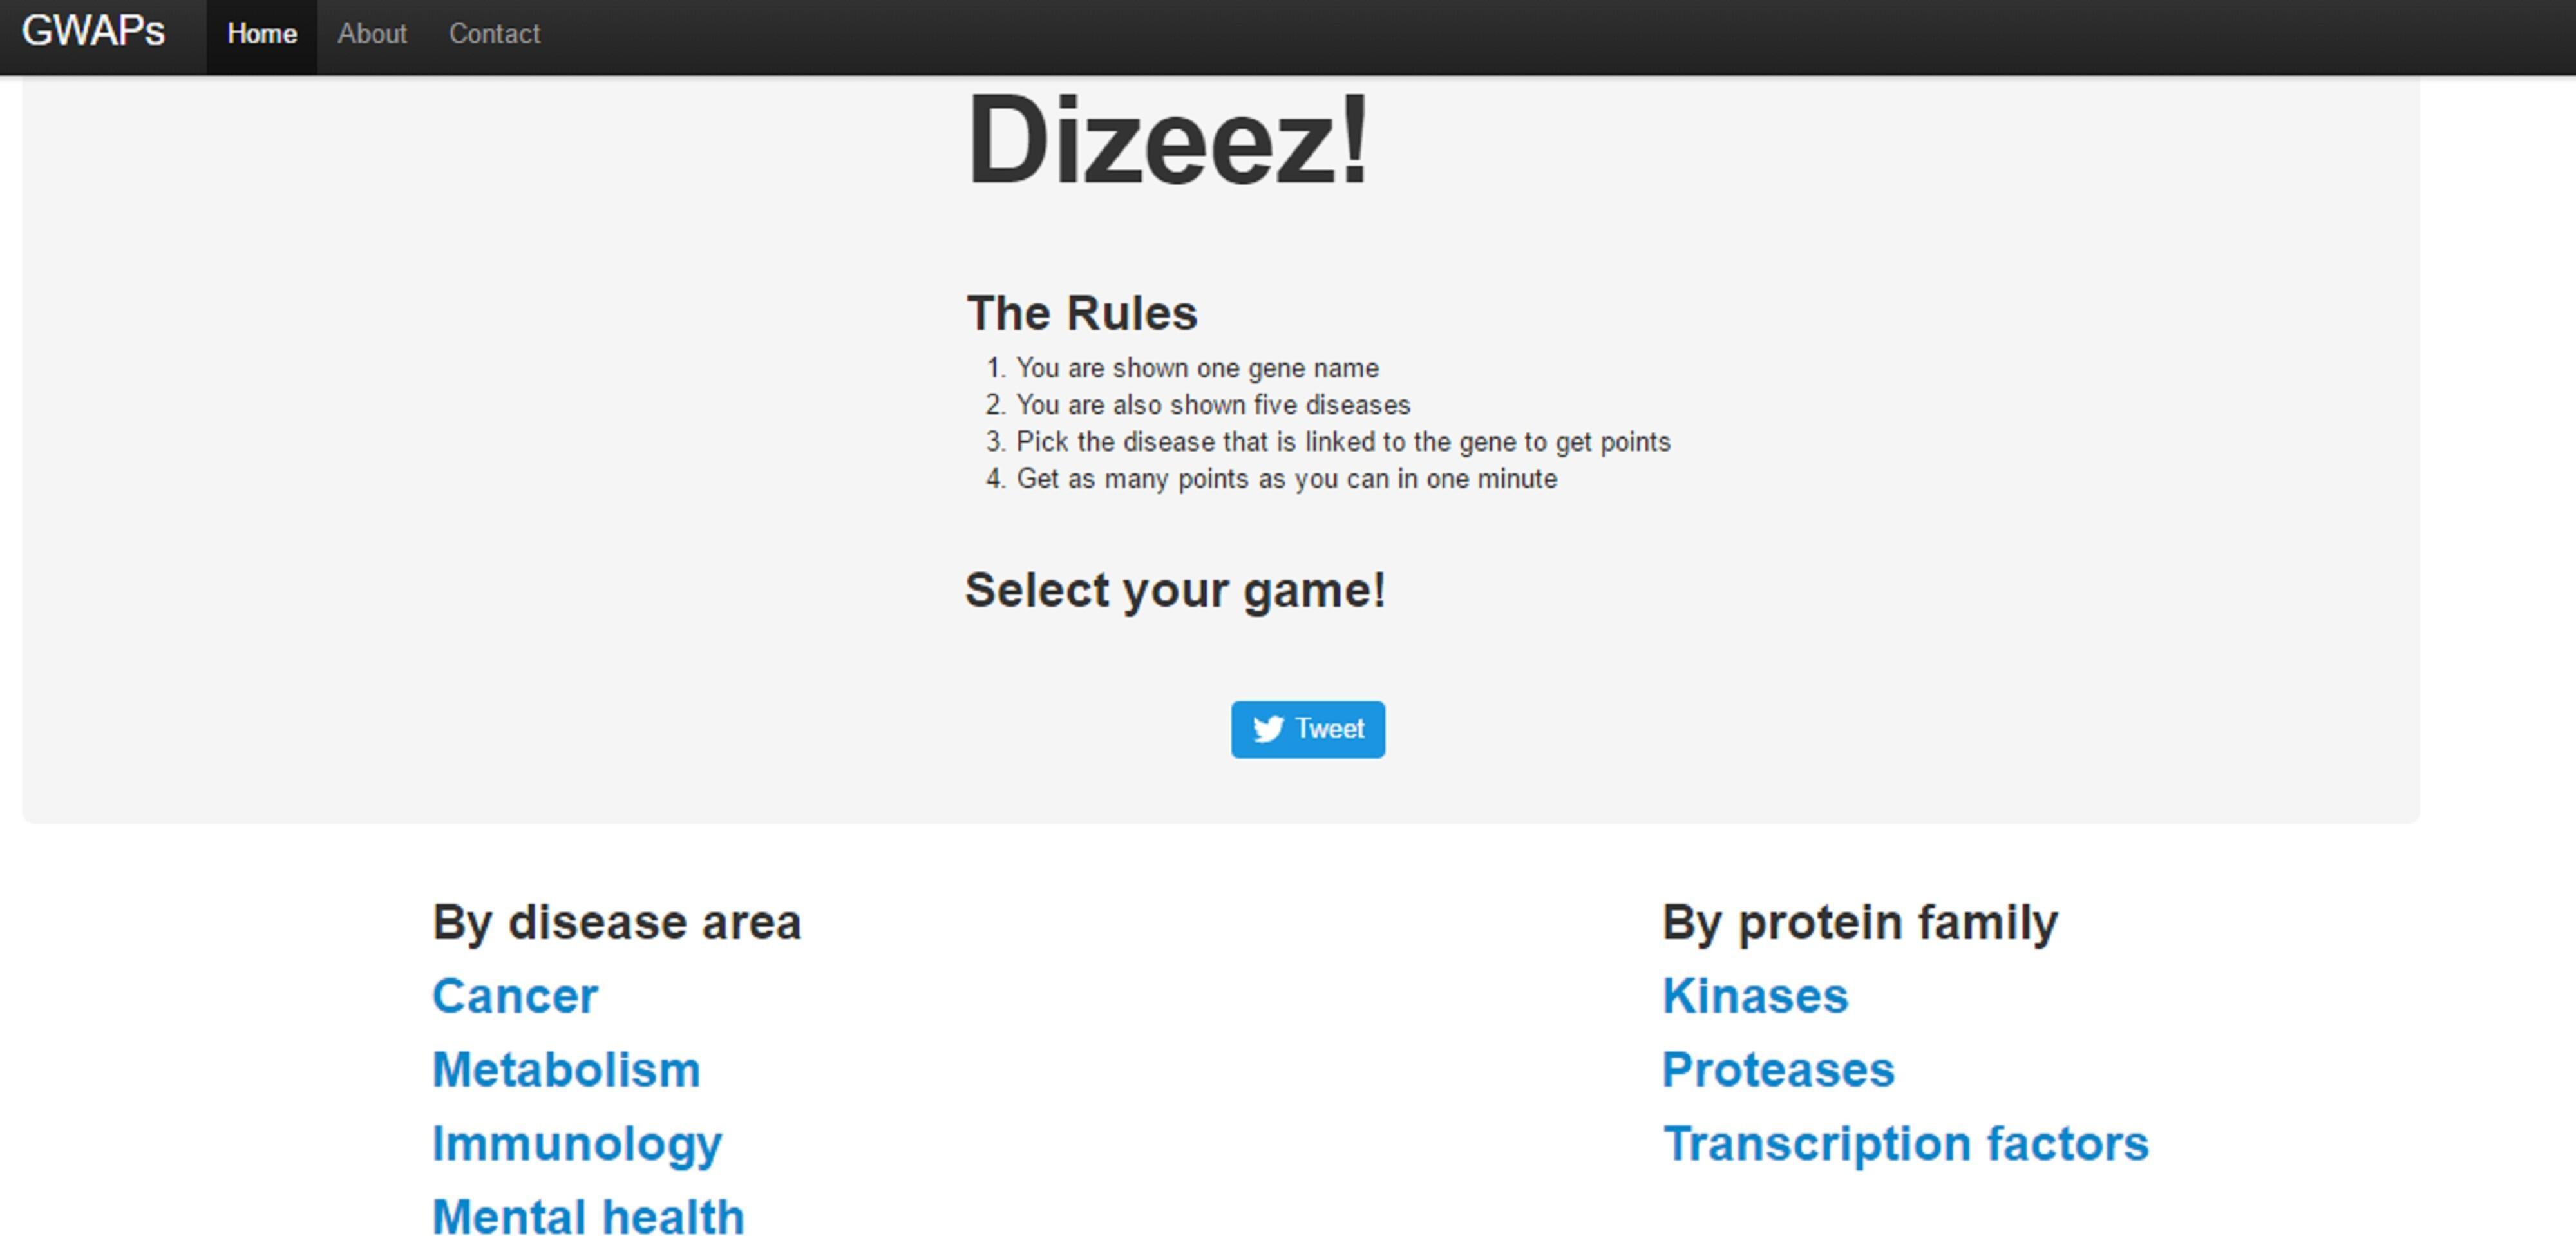 21 Games Ini Tanpa Terasa Akan Bikin Kamu Makin Cerdas Secara Sains